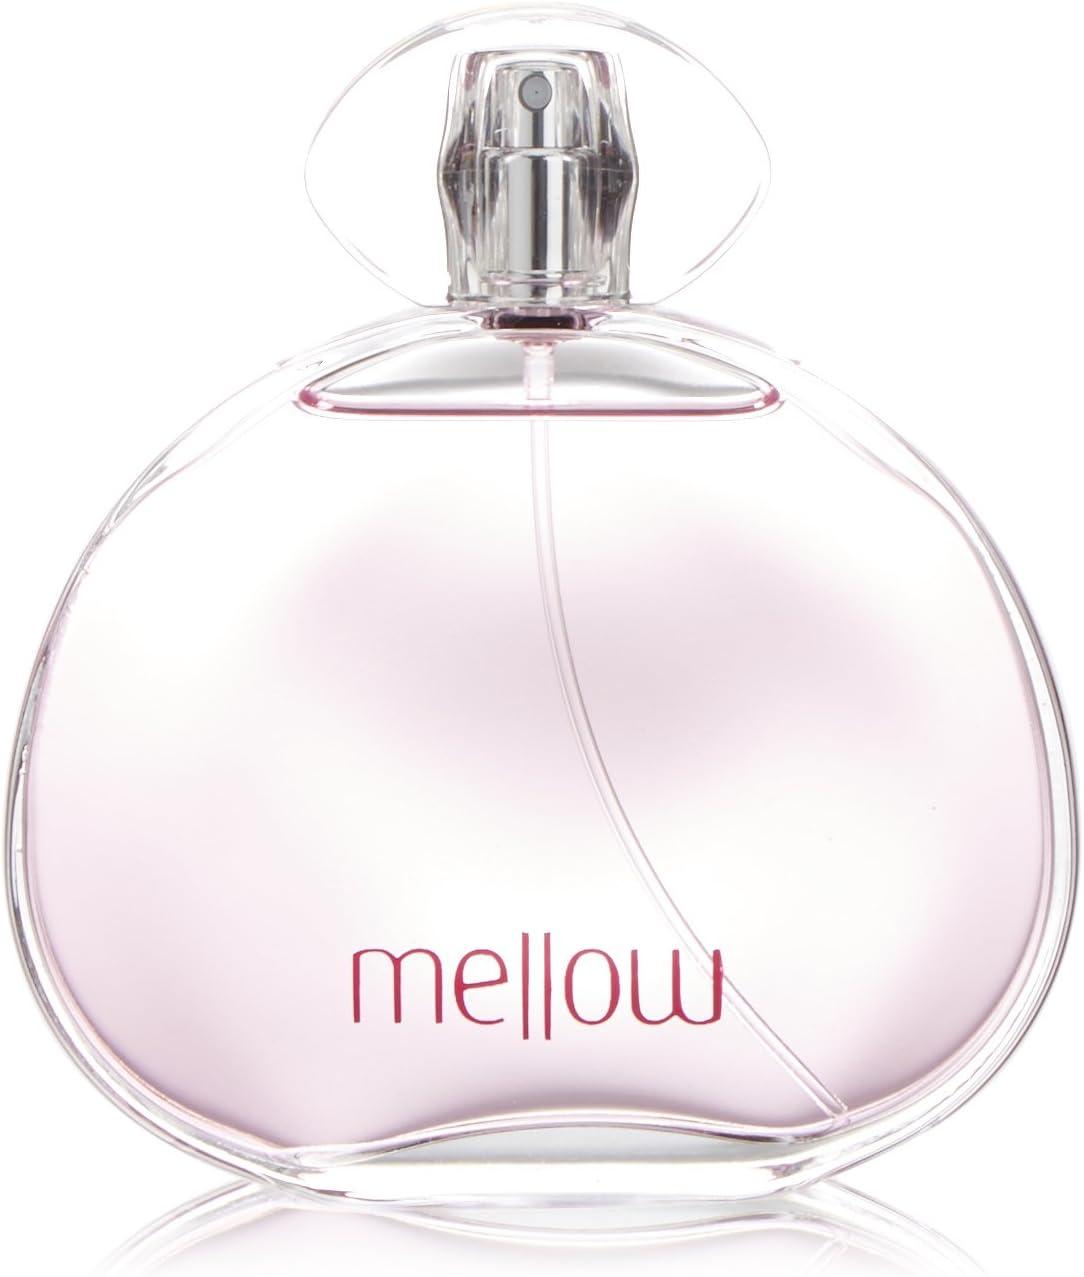 Verino Mellow Agua de Colonia - 90 ml: Amazon.es: Belleza